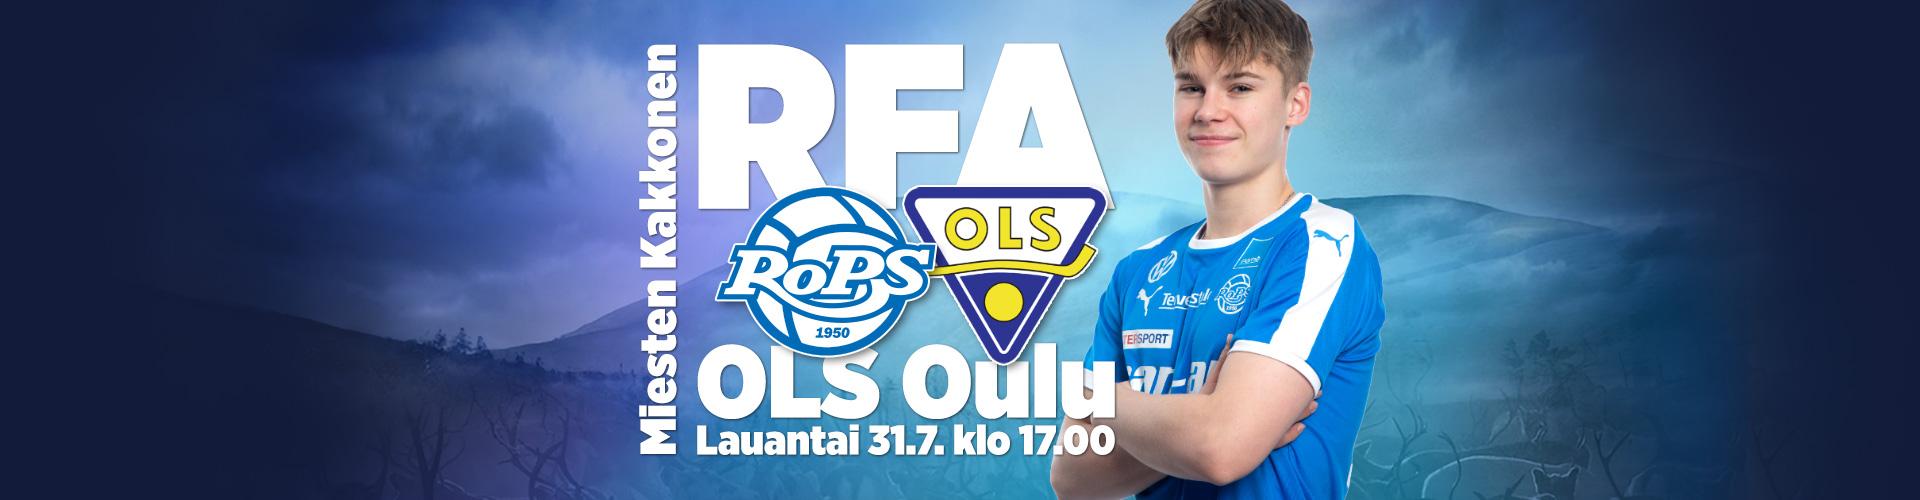 RFA-OLS-Netti